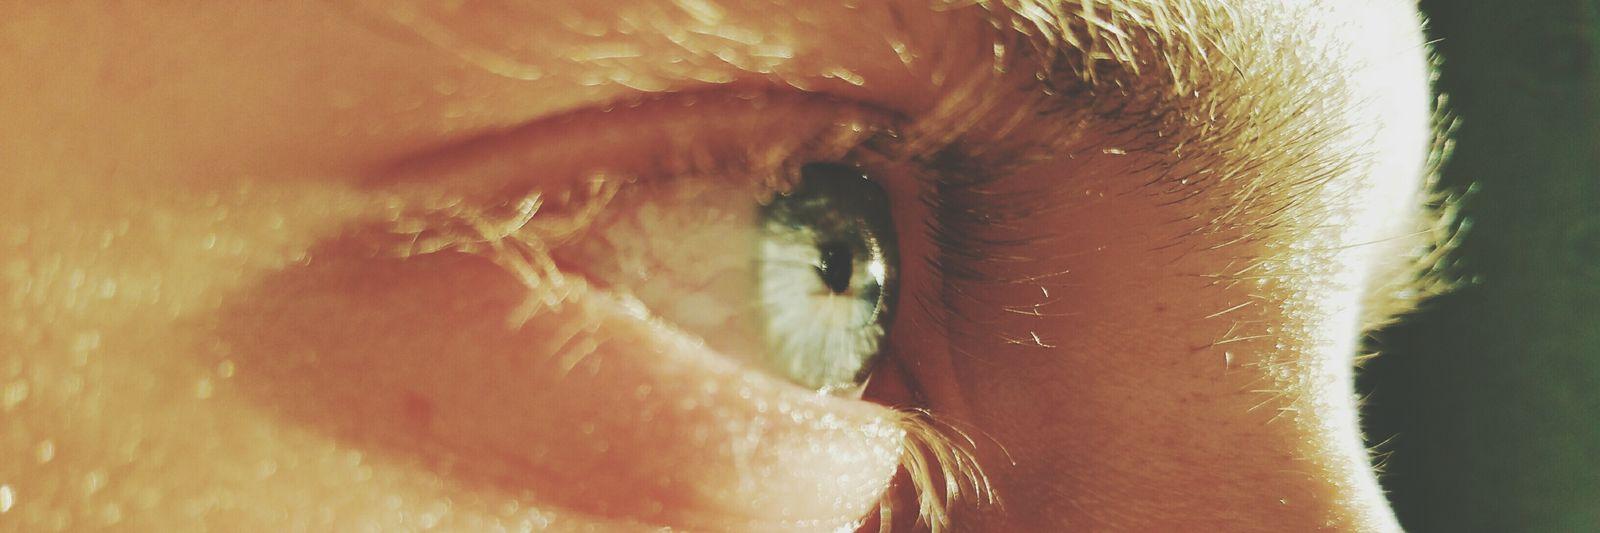 Schatz <3  Blue Eyes Fotografia Instaphoto Follow4follow Samsung Galaxy Note 4 Photography Tagsforlikesfslc